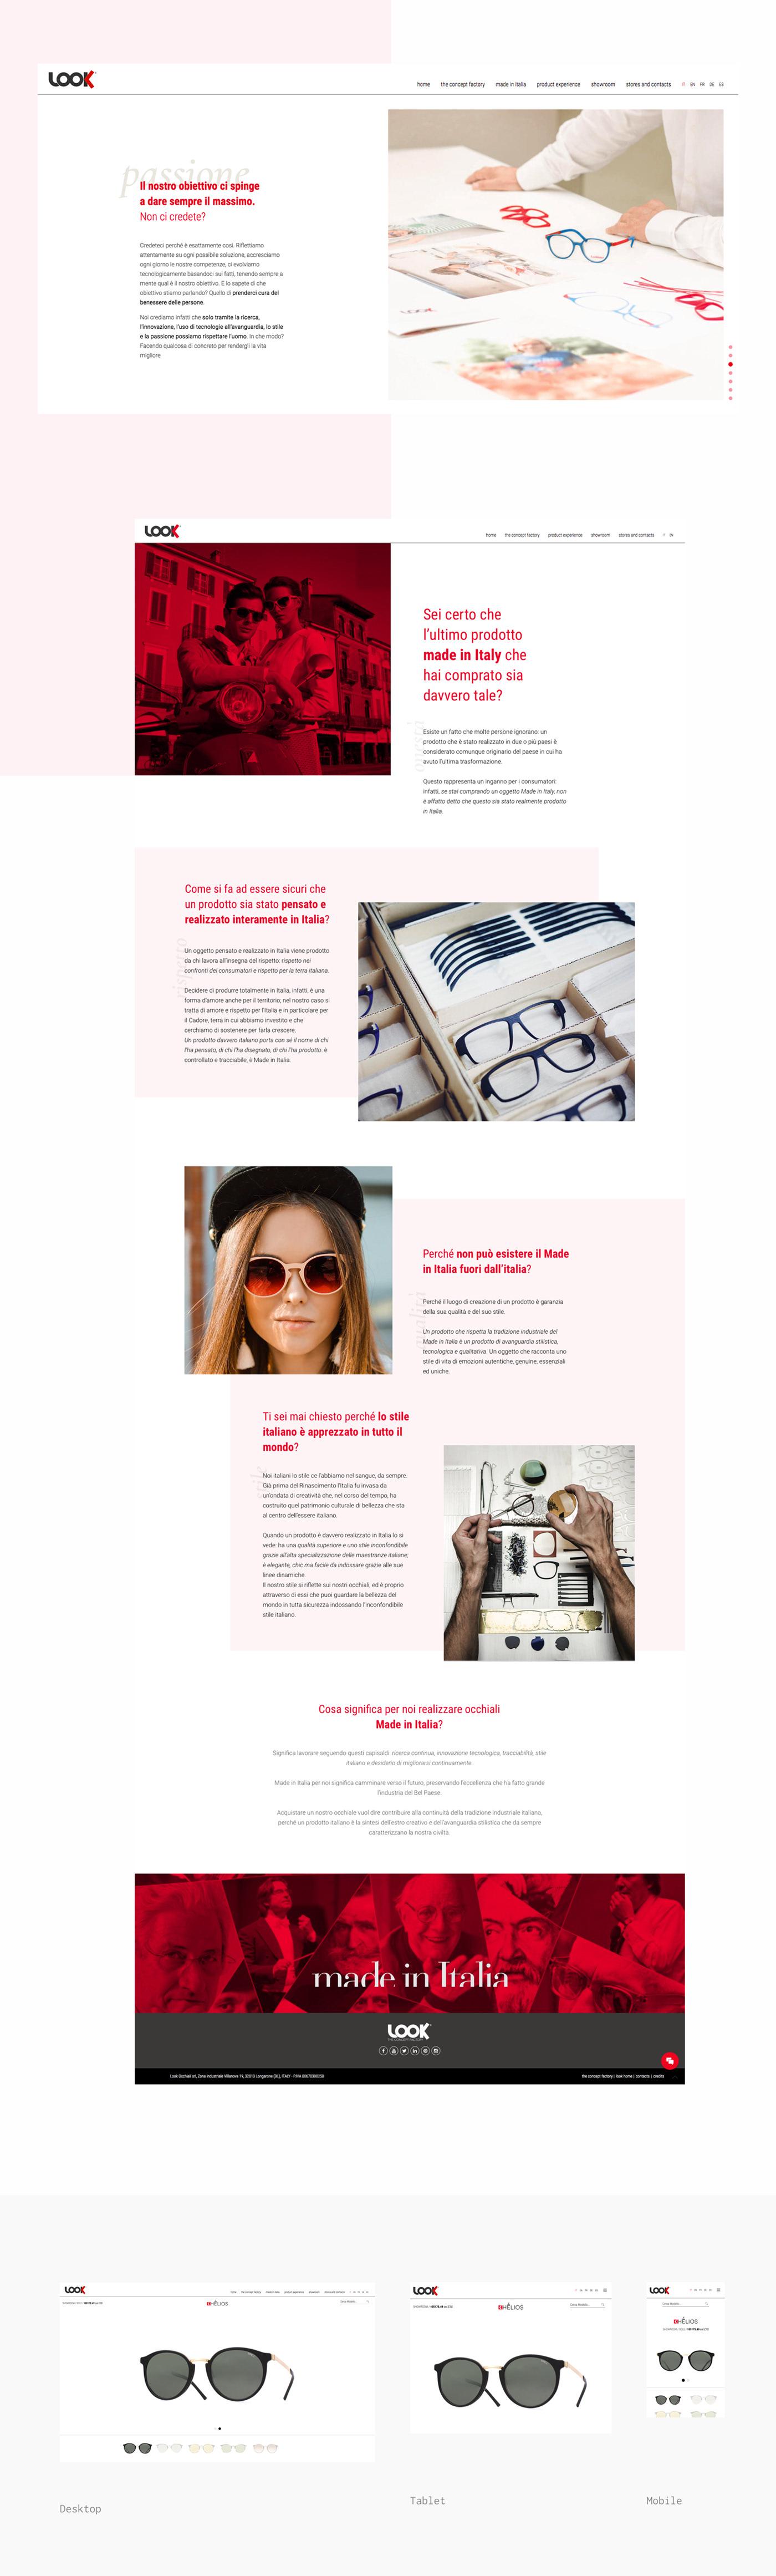 eyewear Sunglasses Web Design  Website Inpiration Layout Fashion  minimal UI/UX Look occhiali